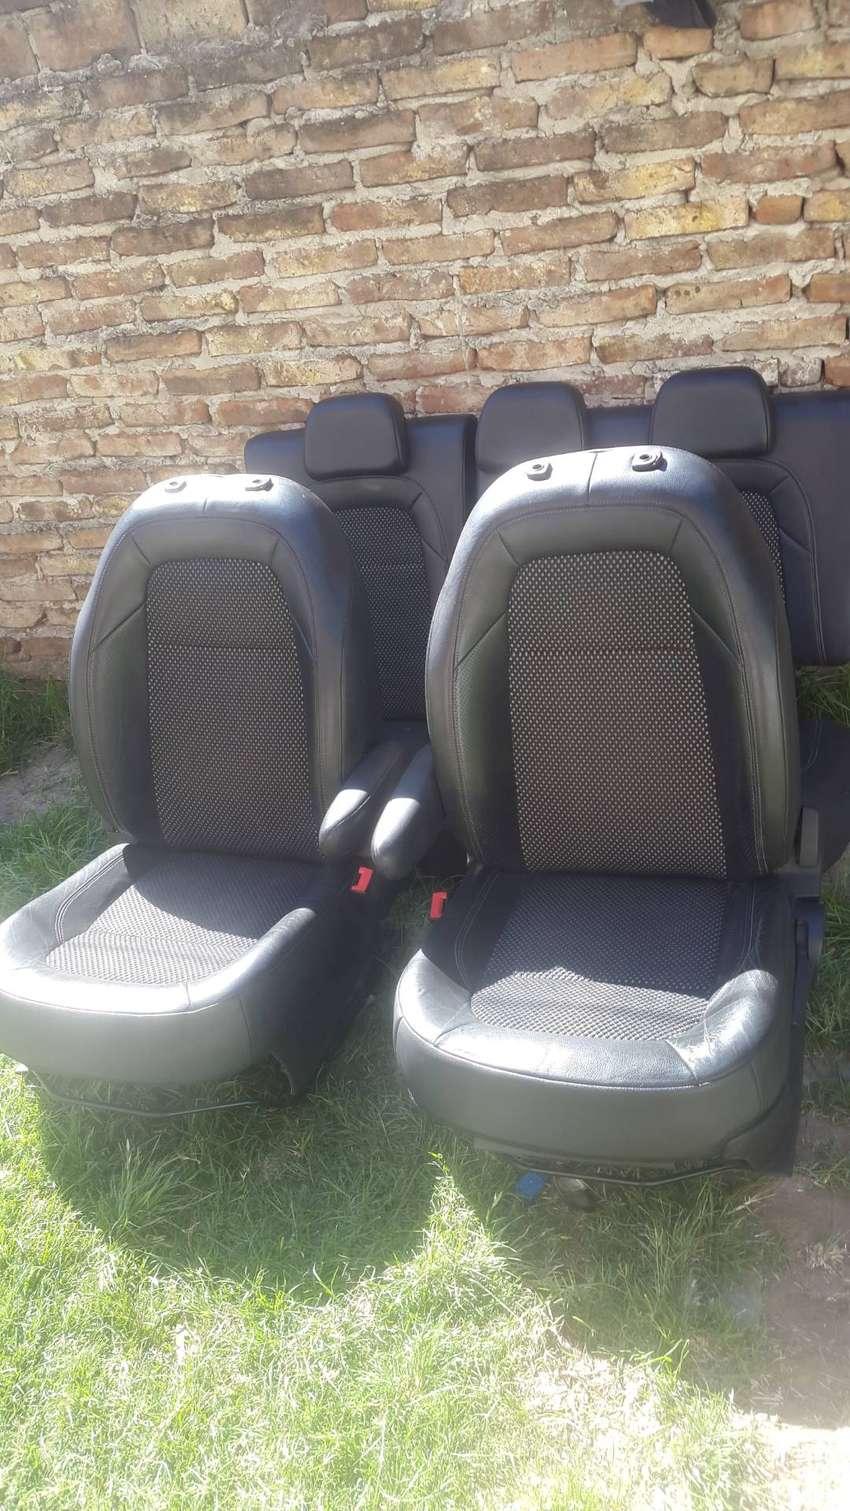 Butacas Citroen C3 Aircross Cuero 0